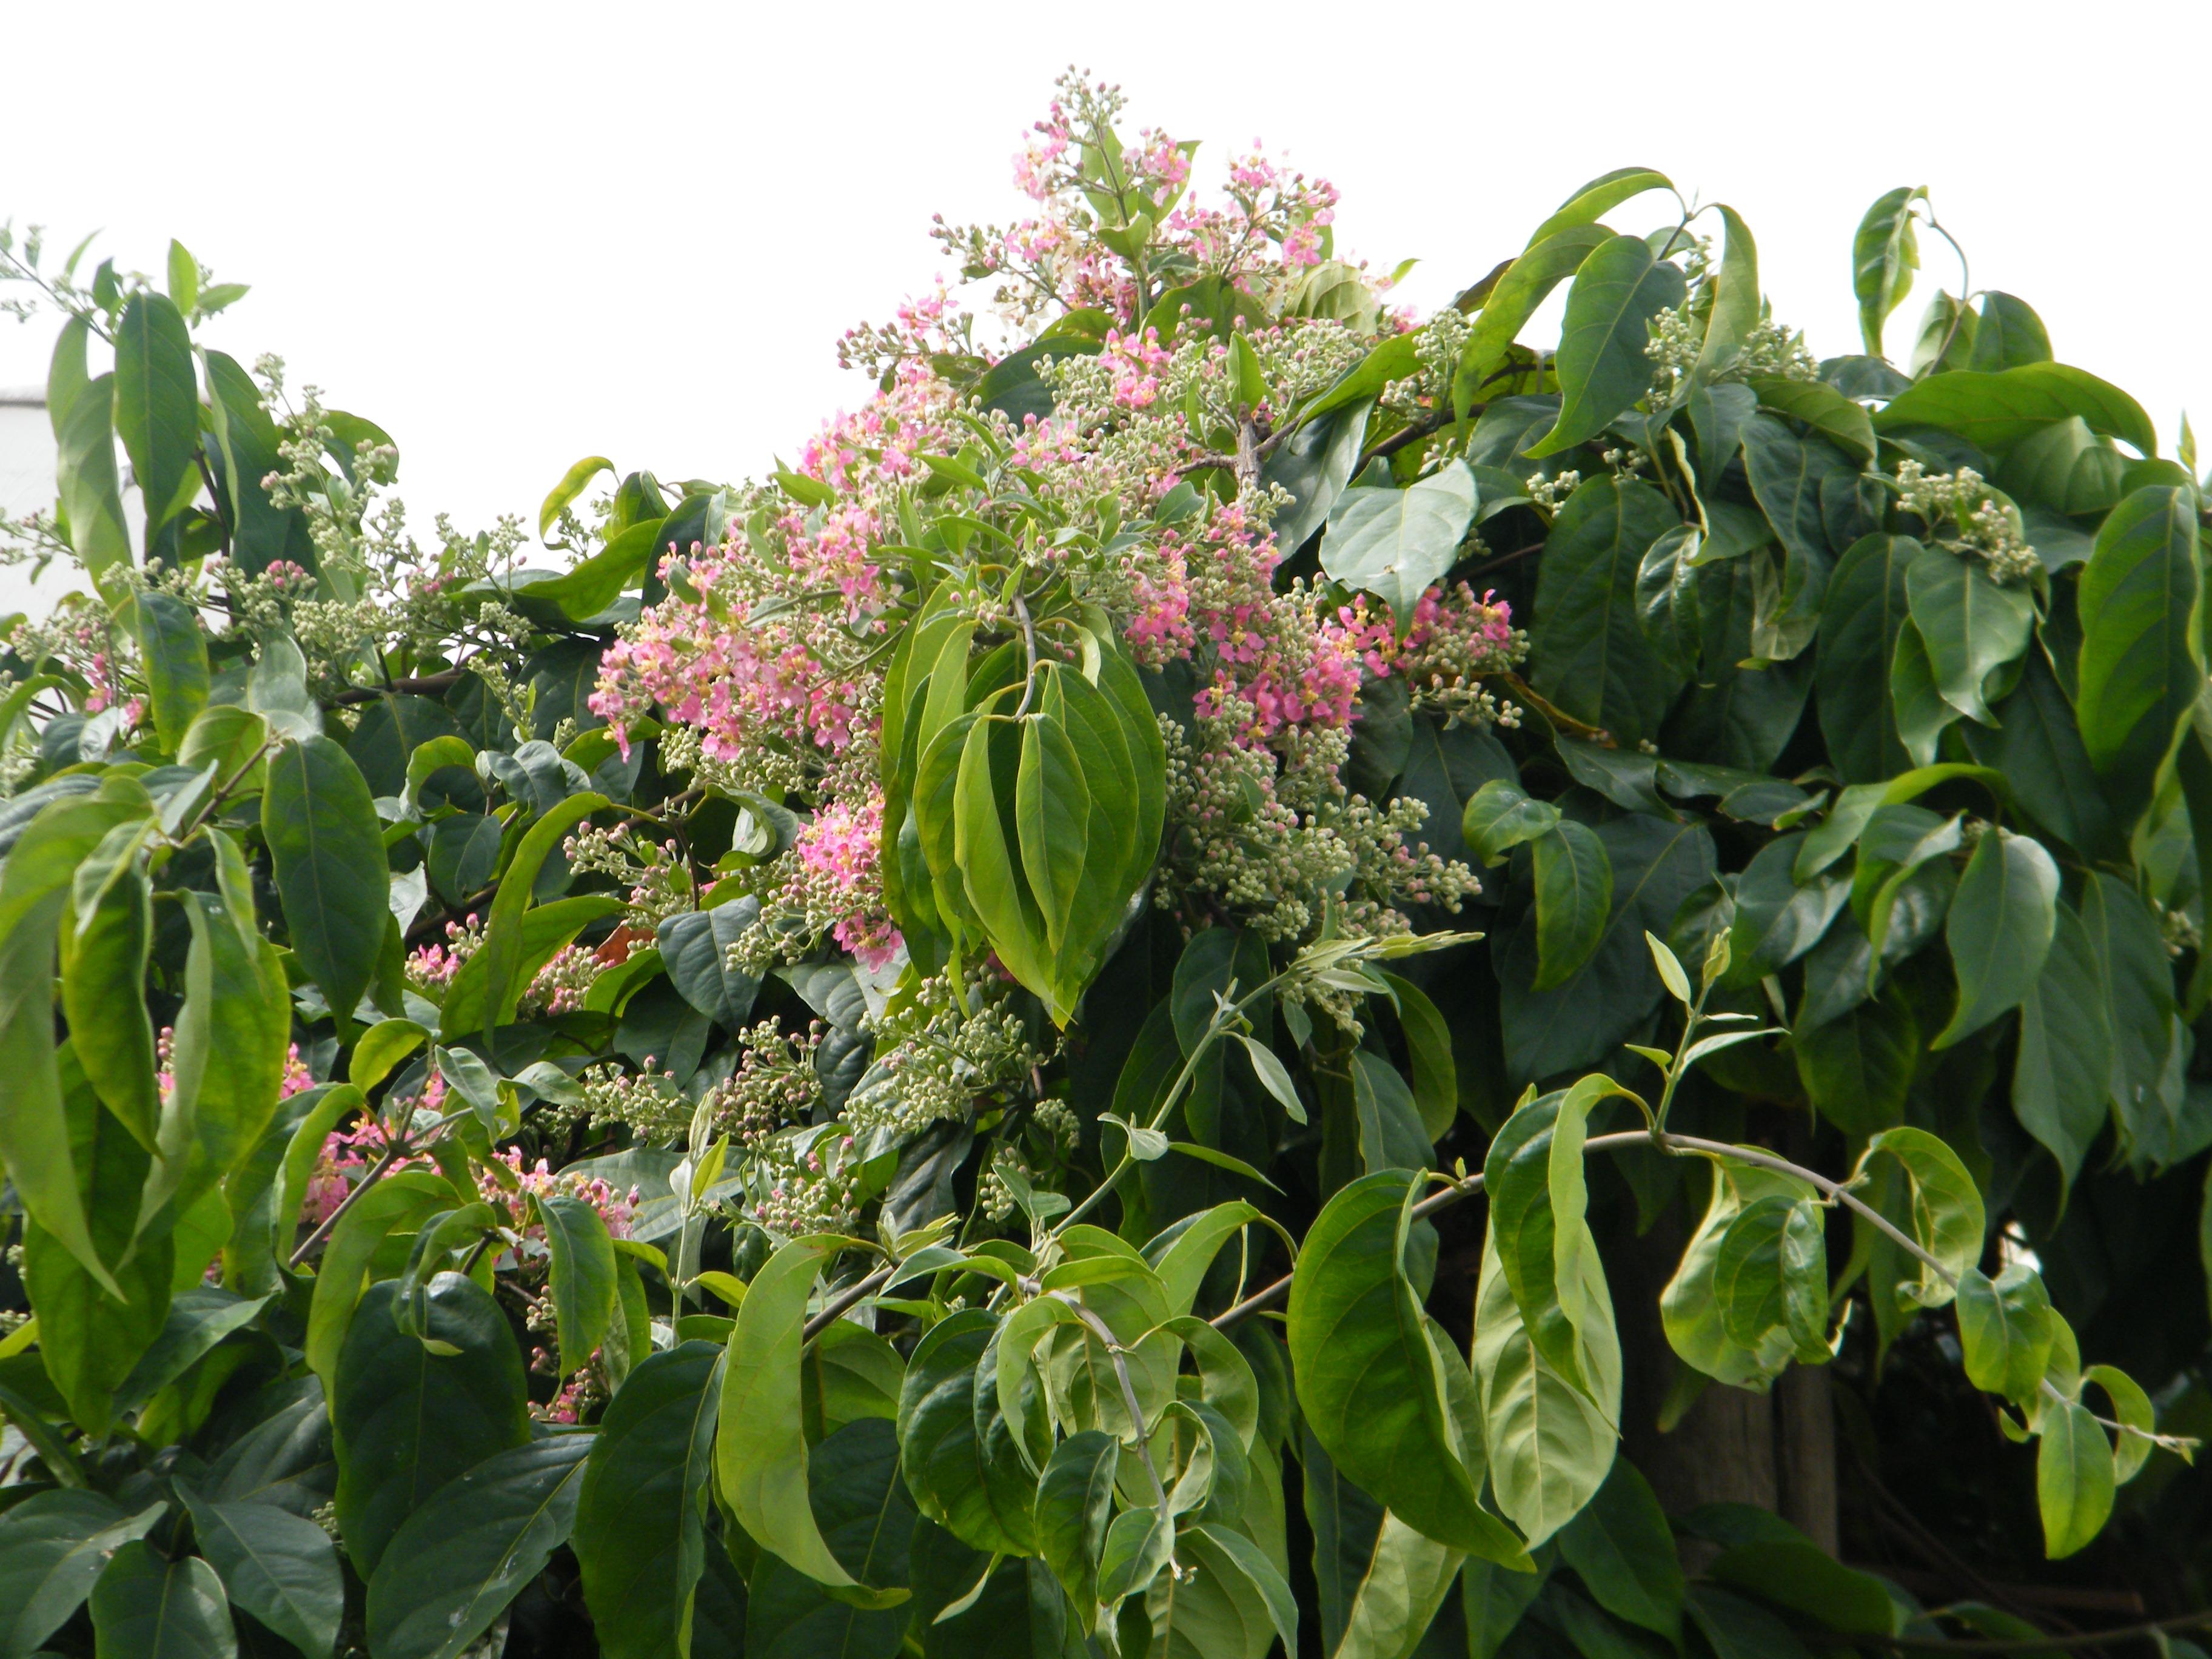 Florada Julho 2015 - 07.JPG